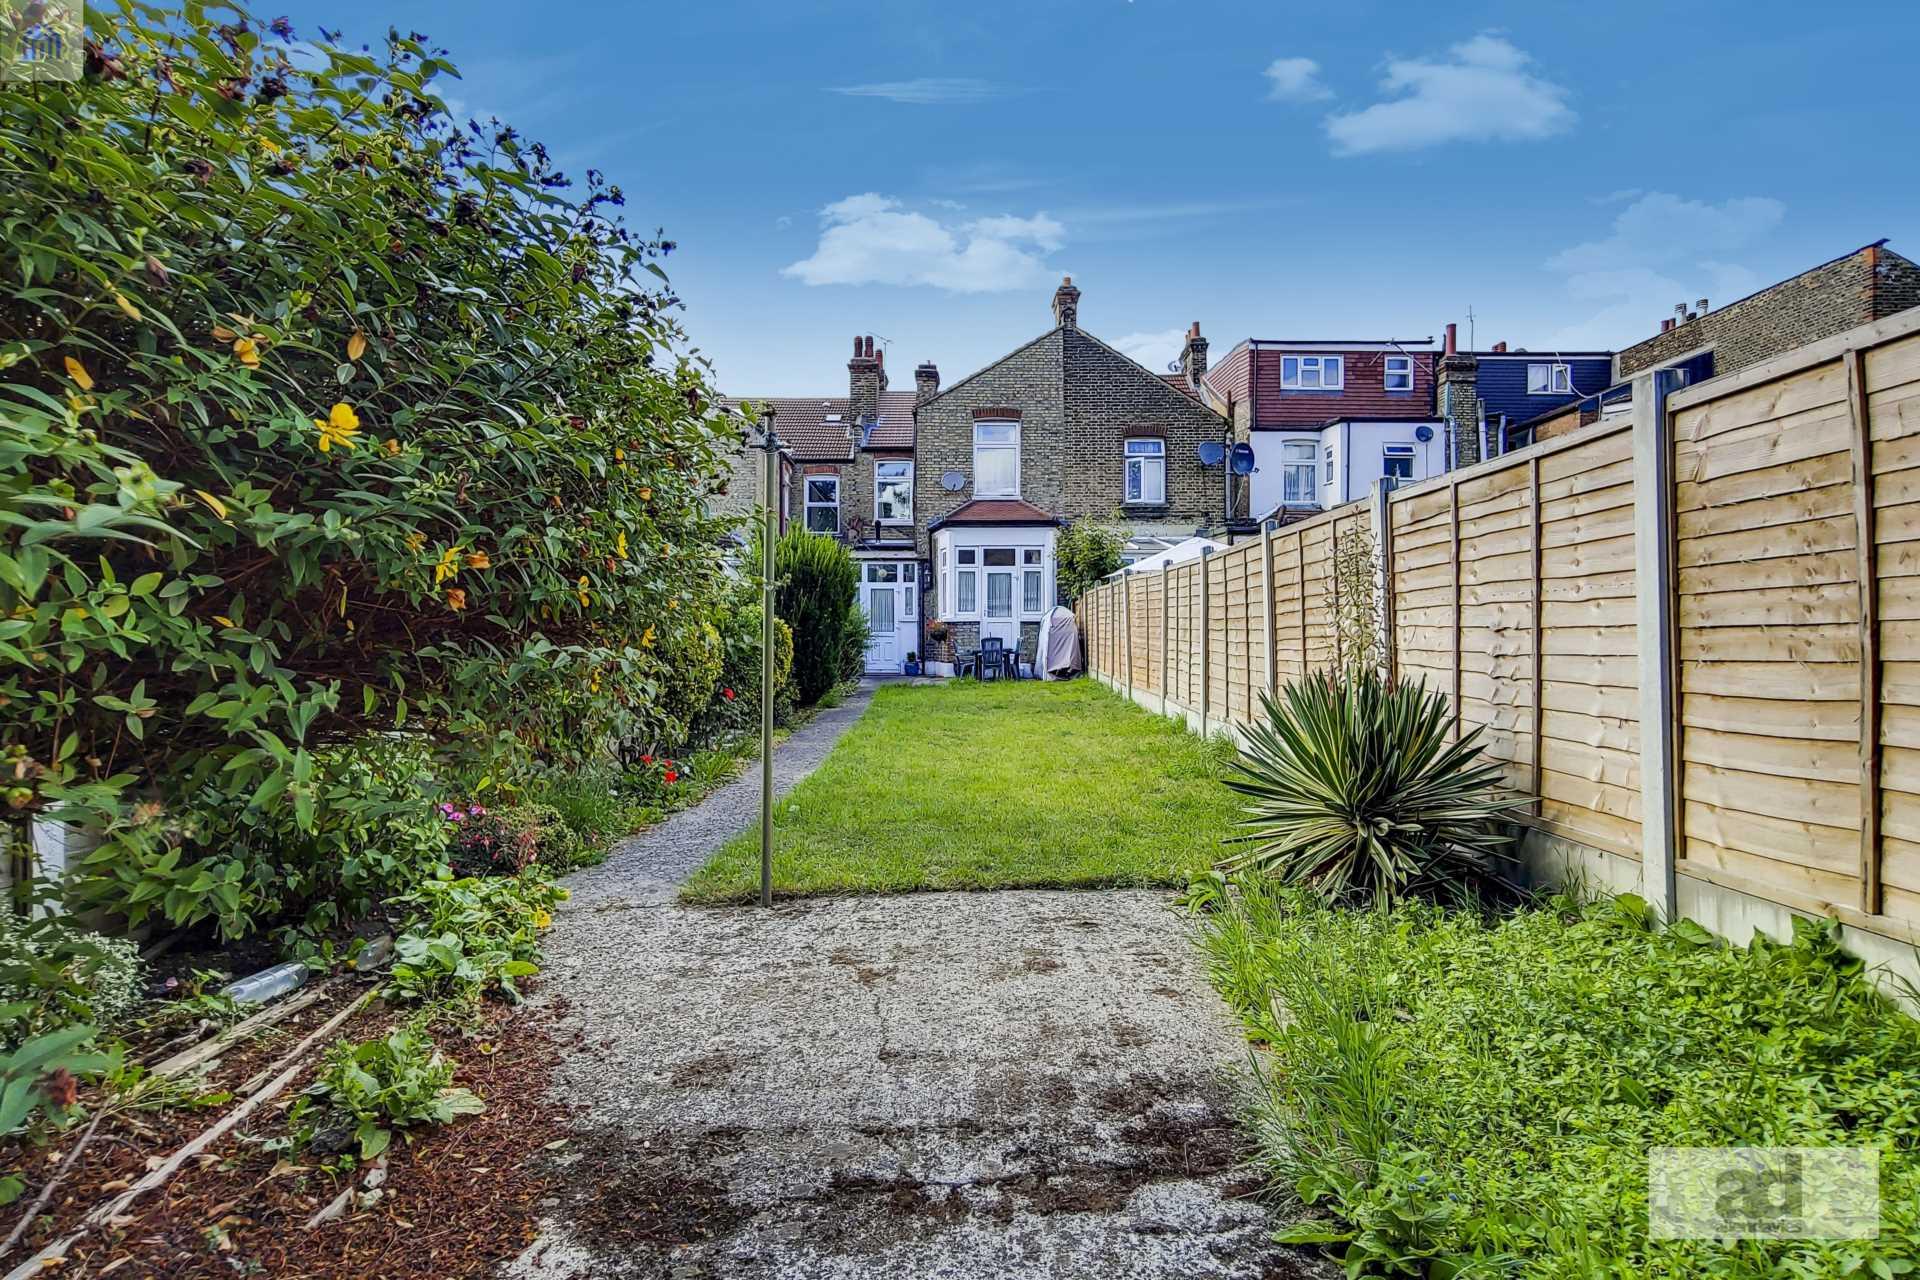 Colchester Road, Leyton,E10, Image 18